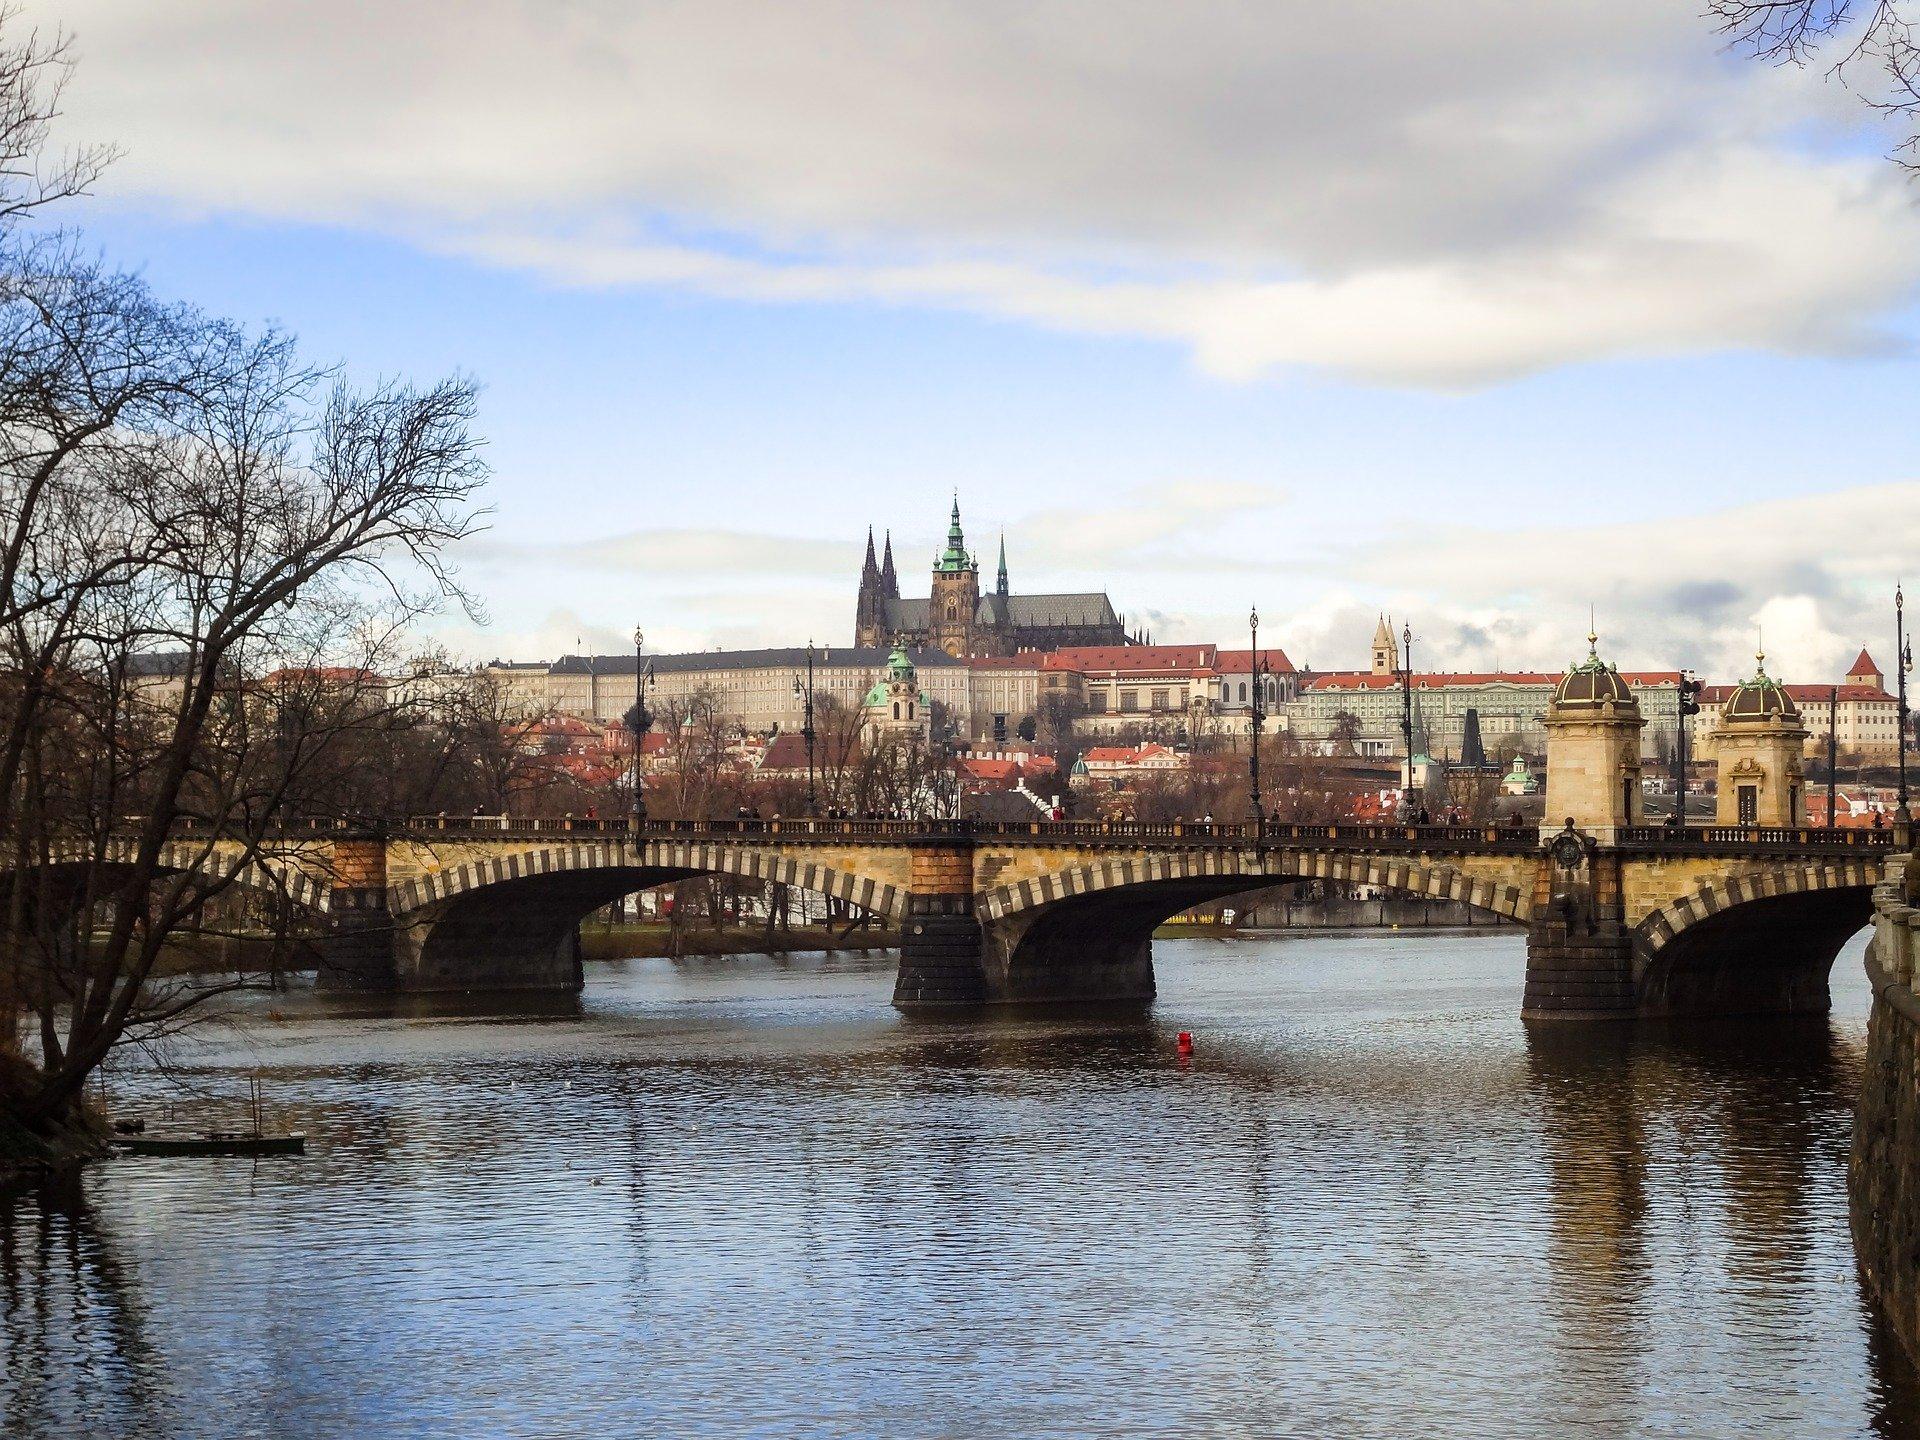 Из-за COVID-19 в Чехии допустили применение «Спутник V» без одобрения ЕС. Фото: pixabay.com